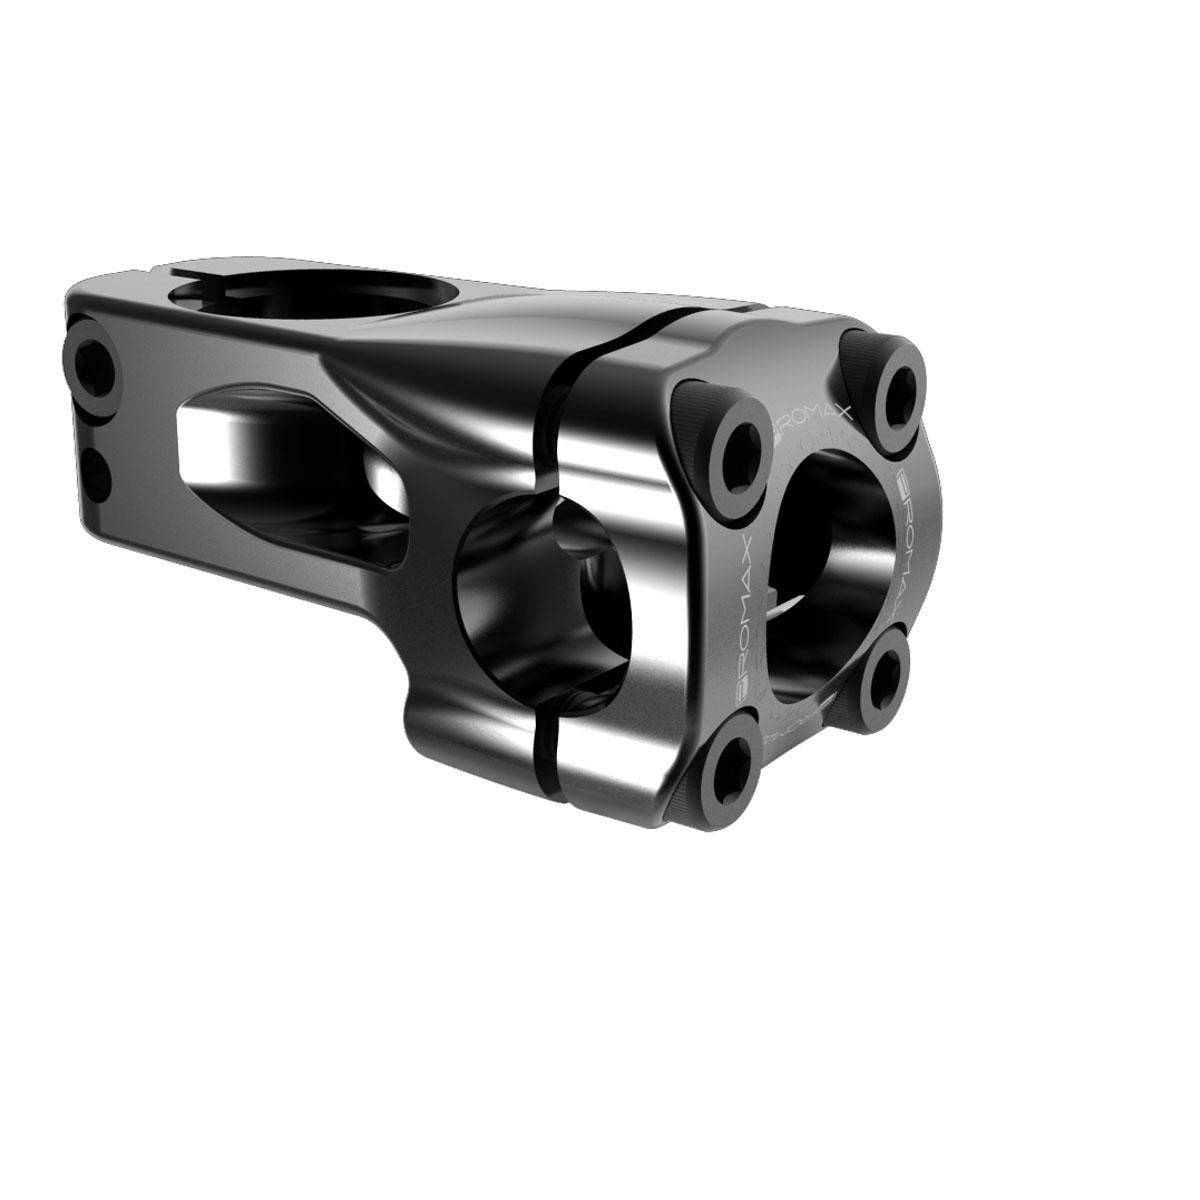 Promax Banger 48mm Front Load Stem +/- 0 degree Black